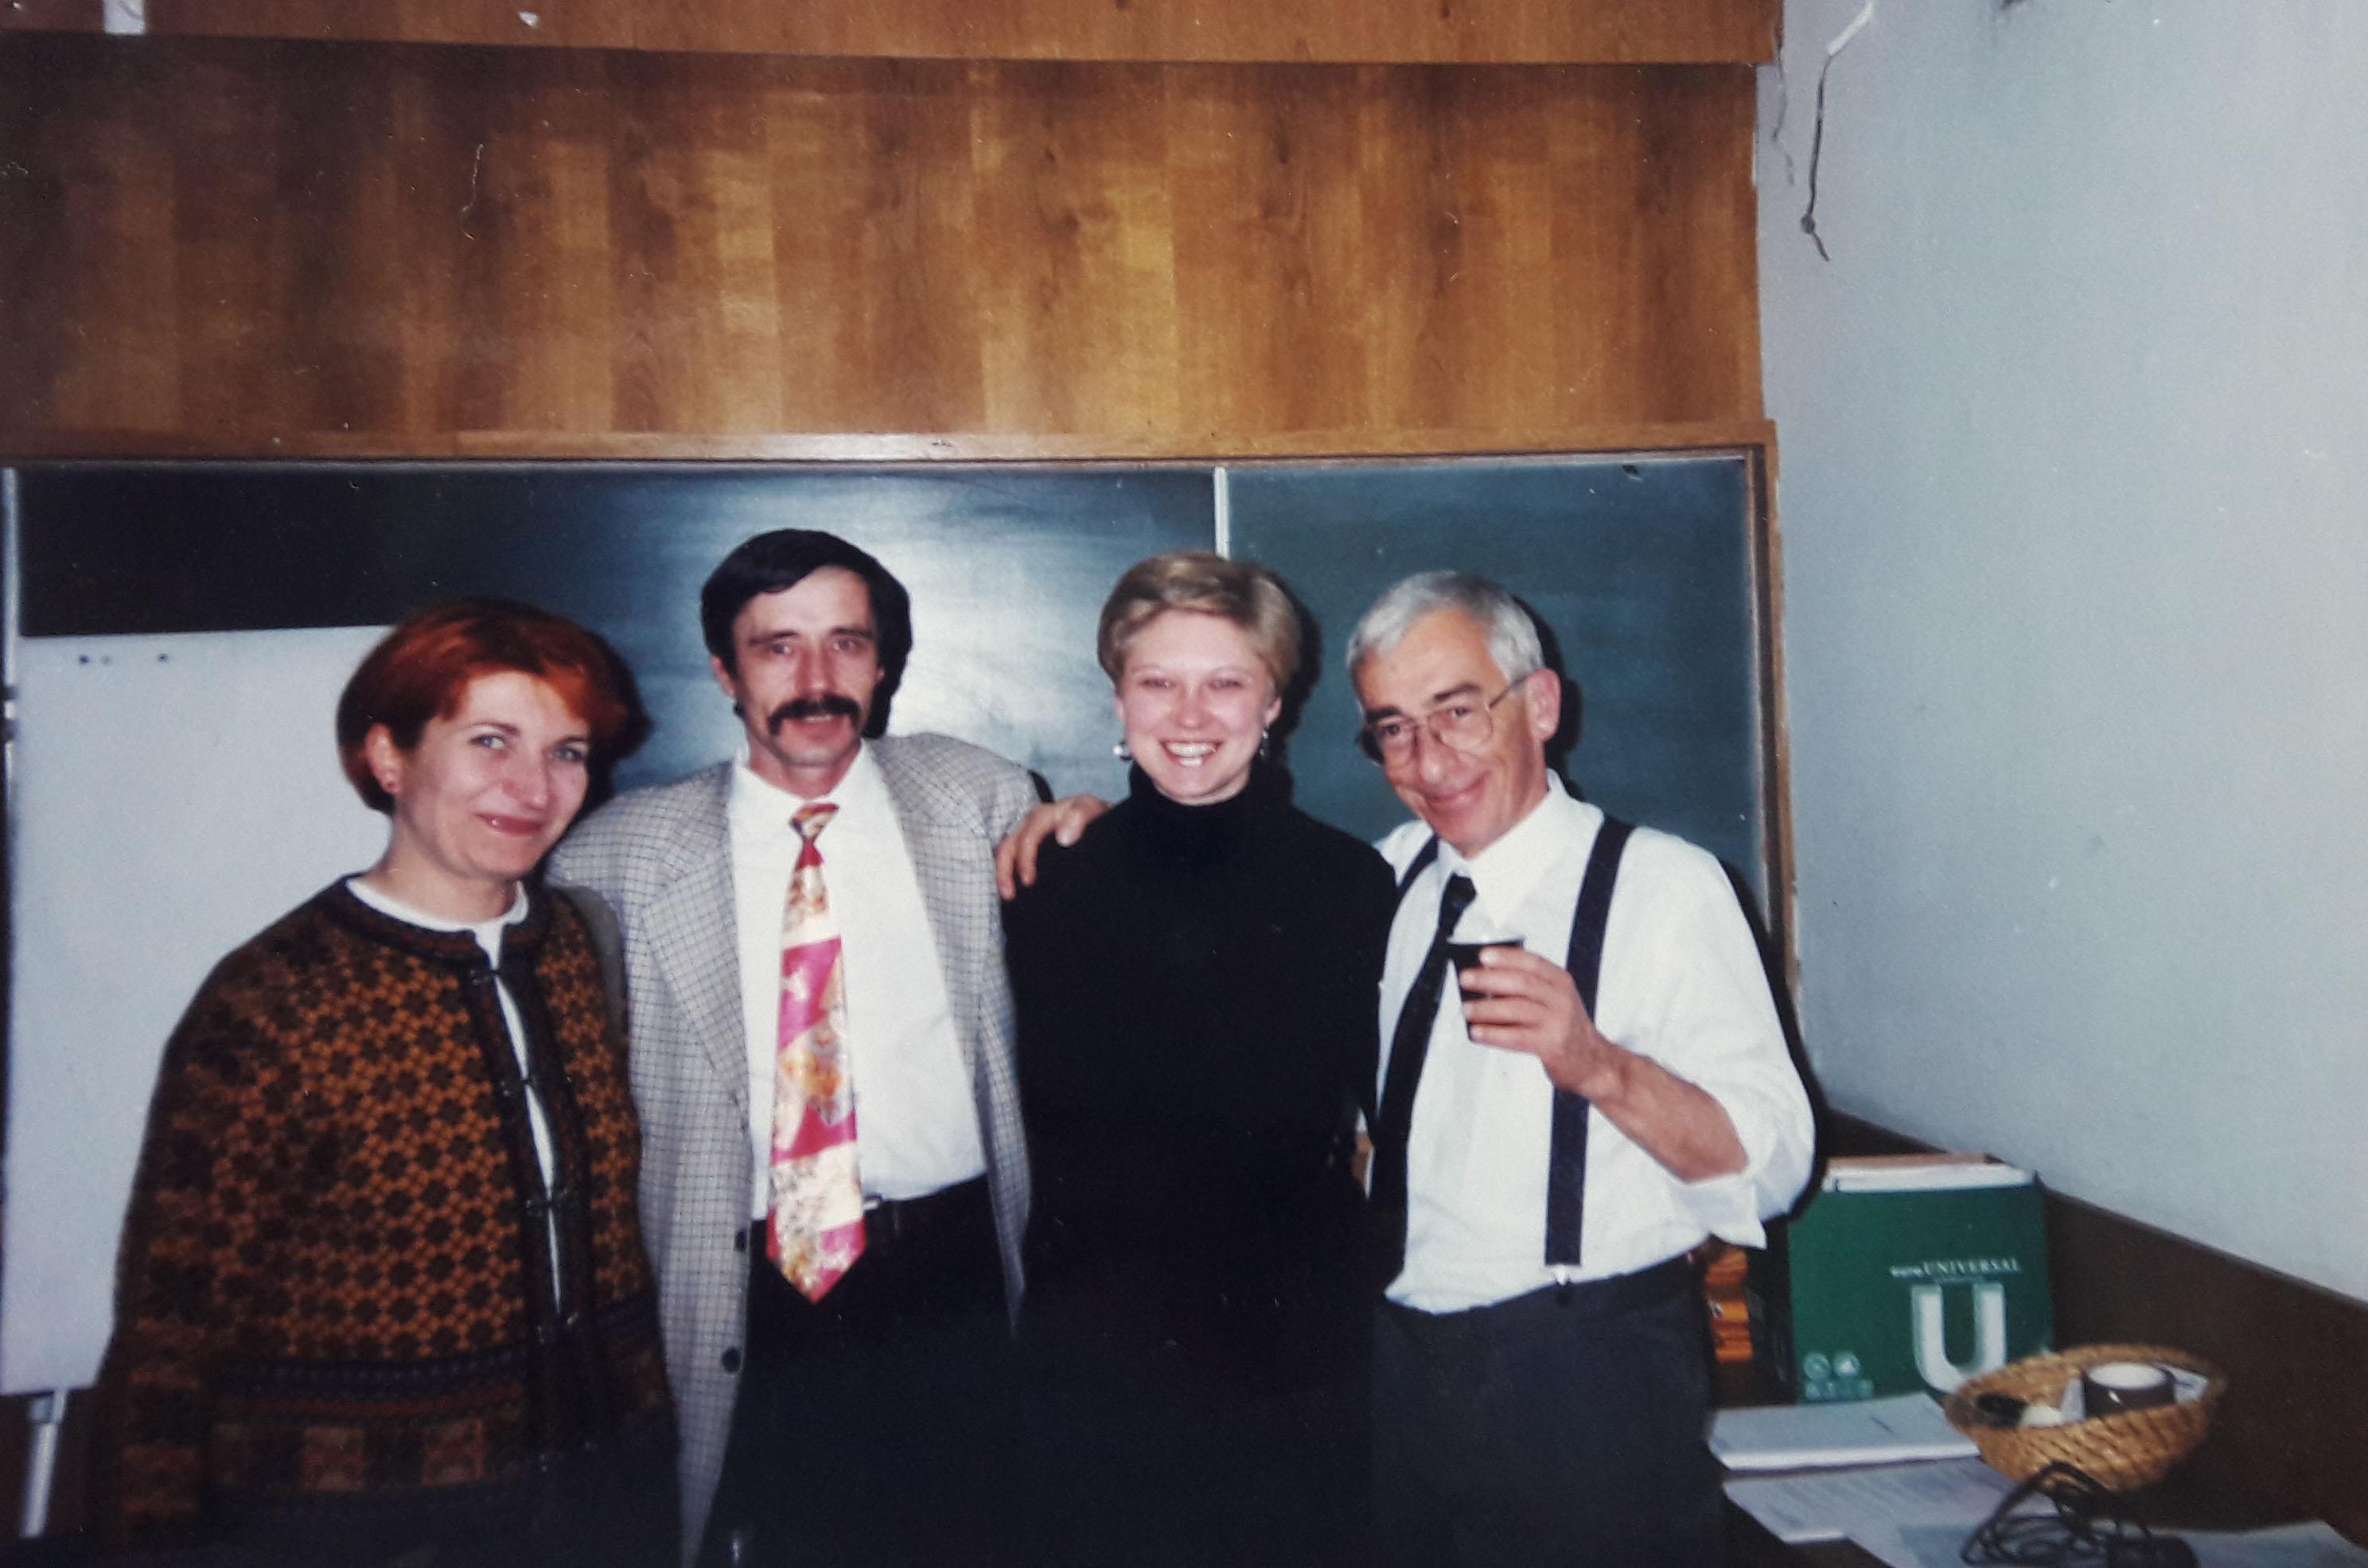 Attending HFHR's human rights courses with, Jacqueline Kacprzak, Ales Danilchyk and Marek Nowicki in Warsaw, 1998. Photo: Tatsiana Reviaka.